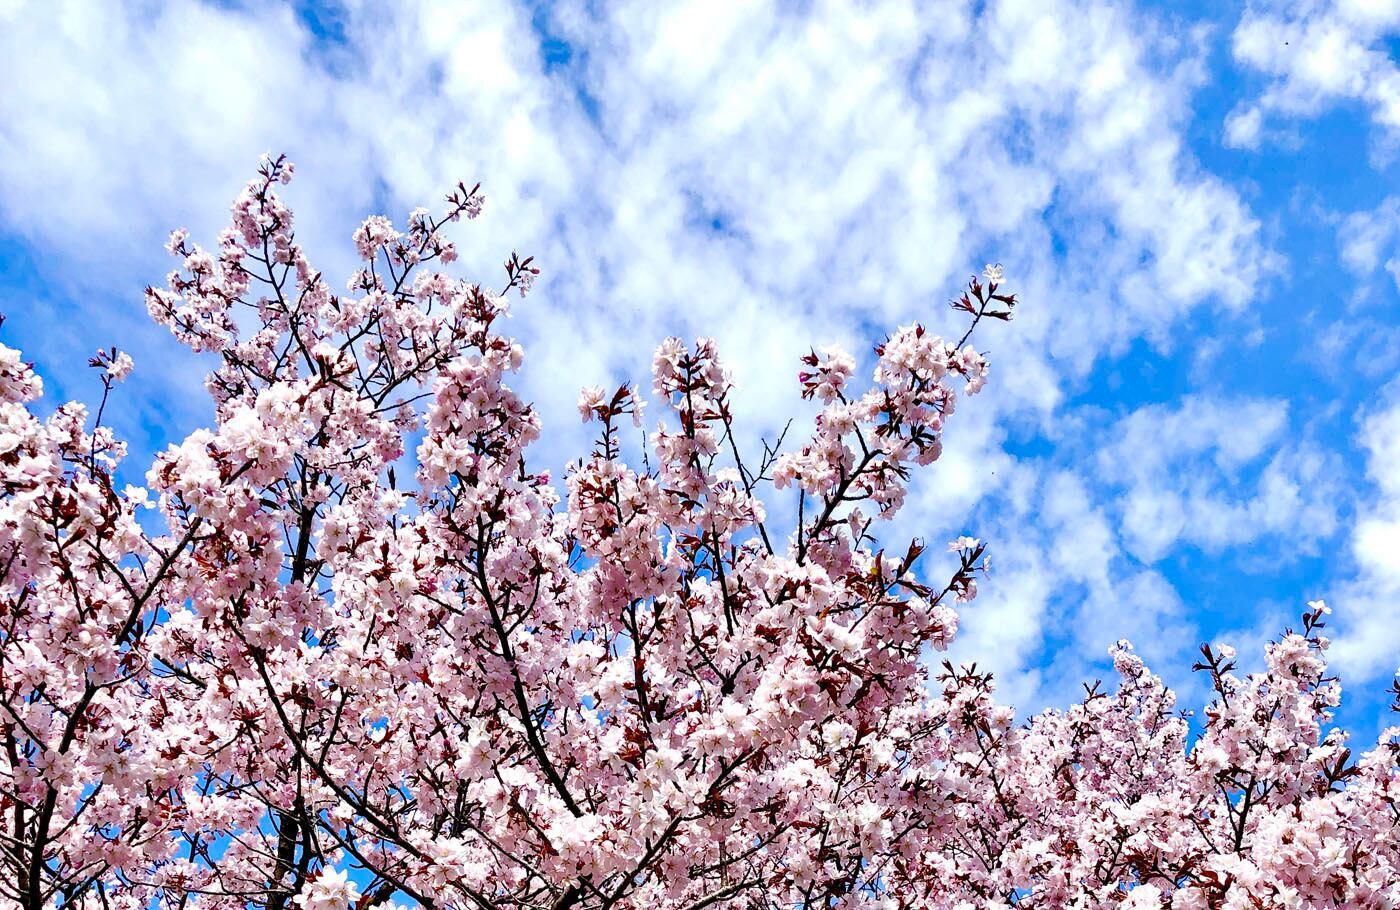 Photo Cherry blossom and sky